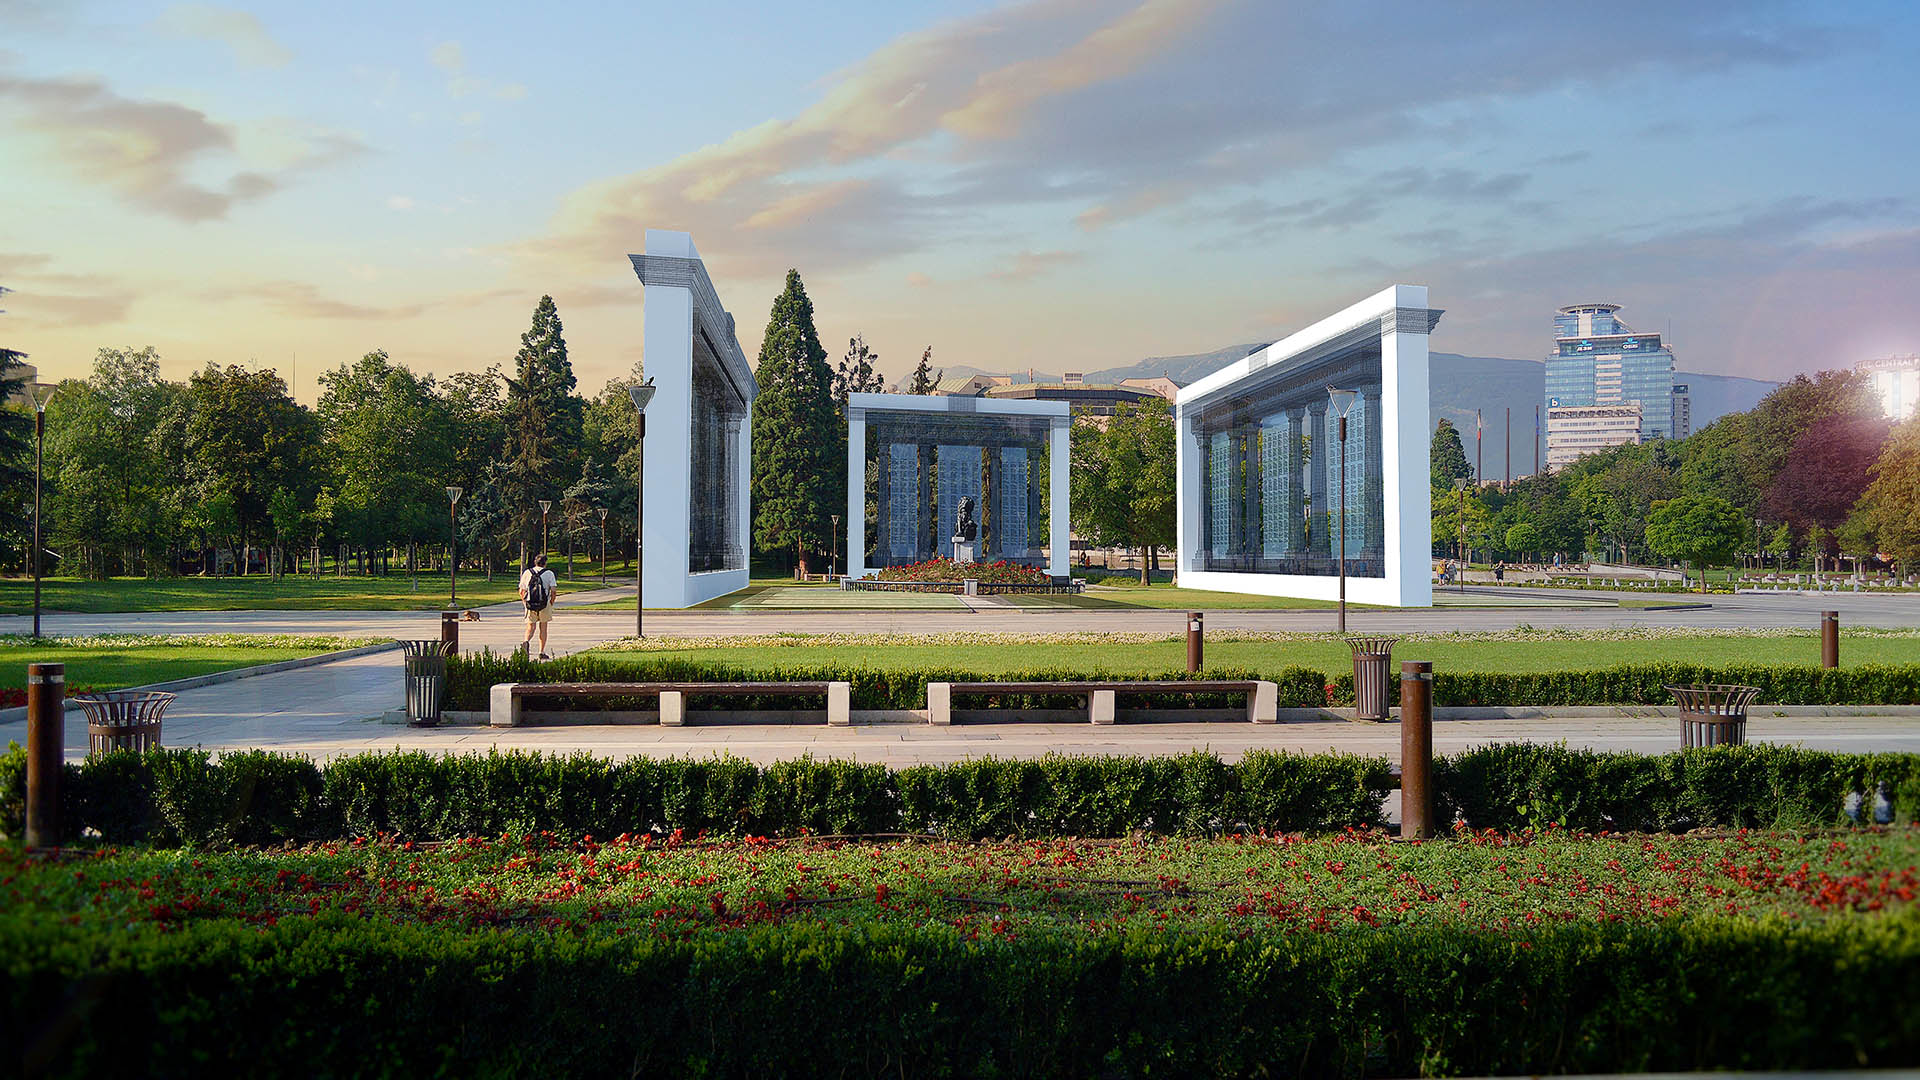 monument-erich-milenov-krasimir-kapitanov-vyzstanovqvane-pametnik-pyrvi-shesti- pehotni-polkove-sofia-ndk-architect-project